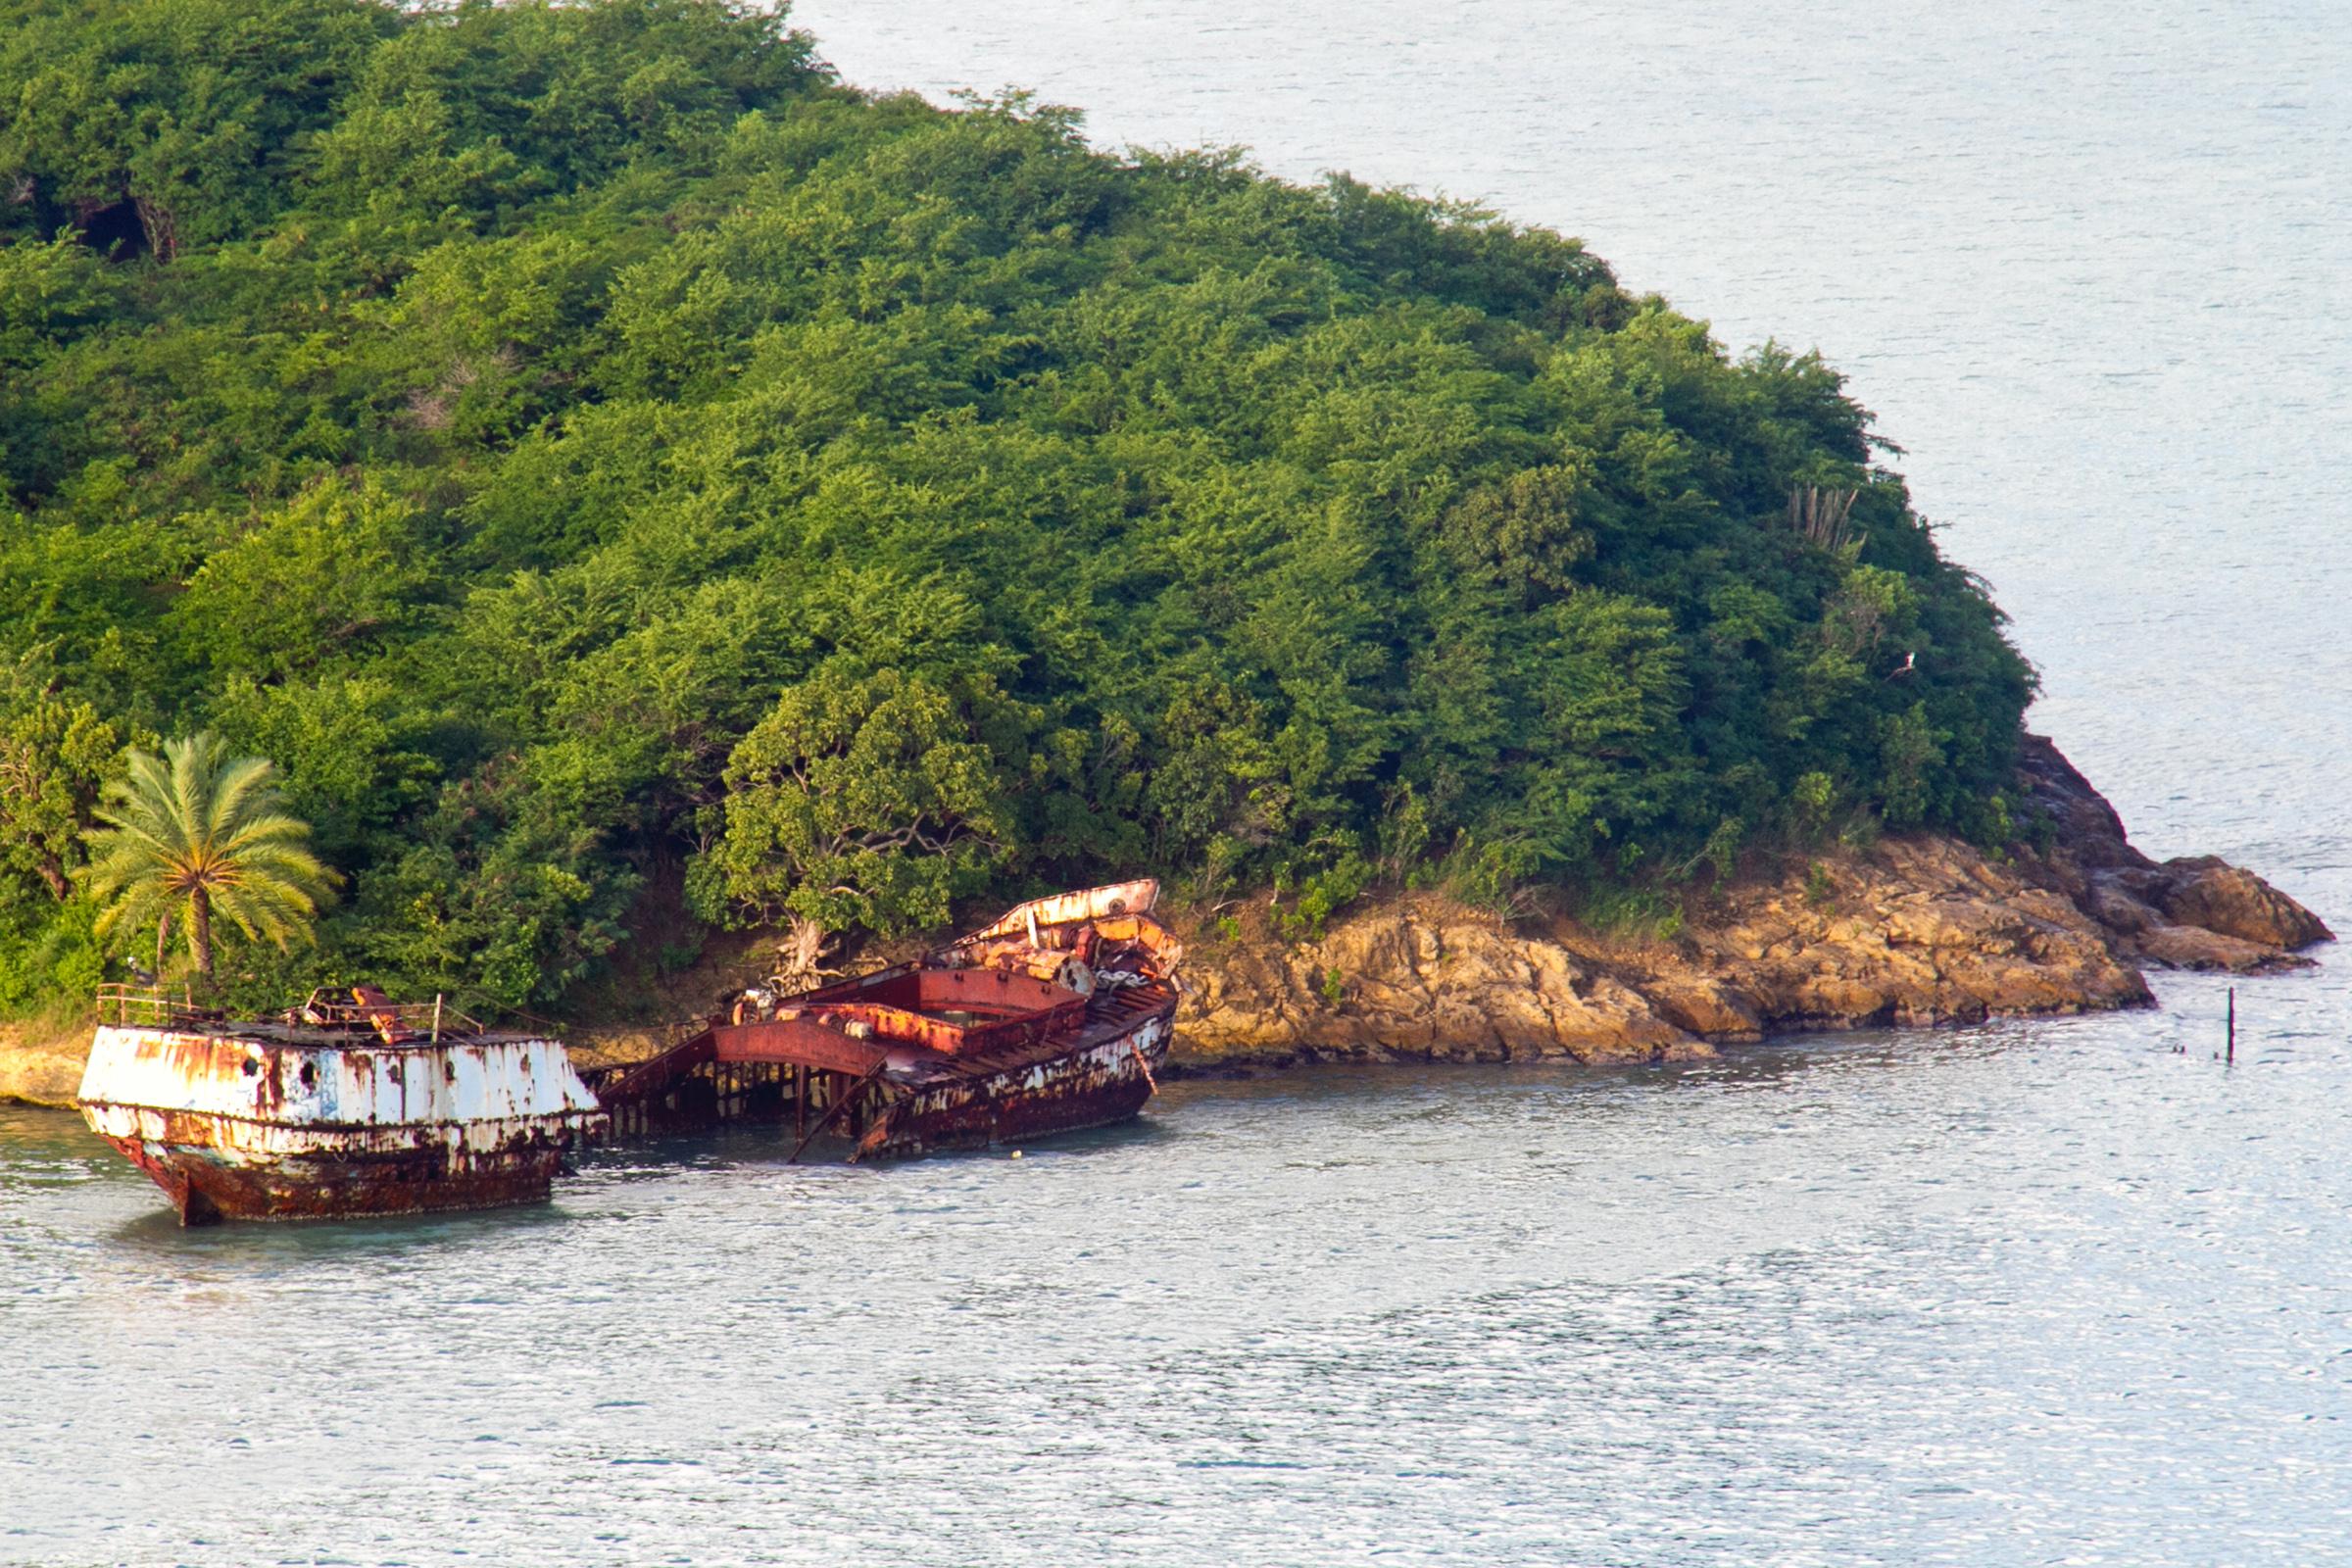 Shipwreck by the Coast, Abandoned, Rocks, Sunk, Shore, HQ Photo